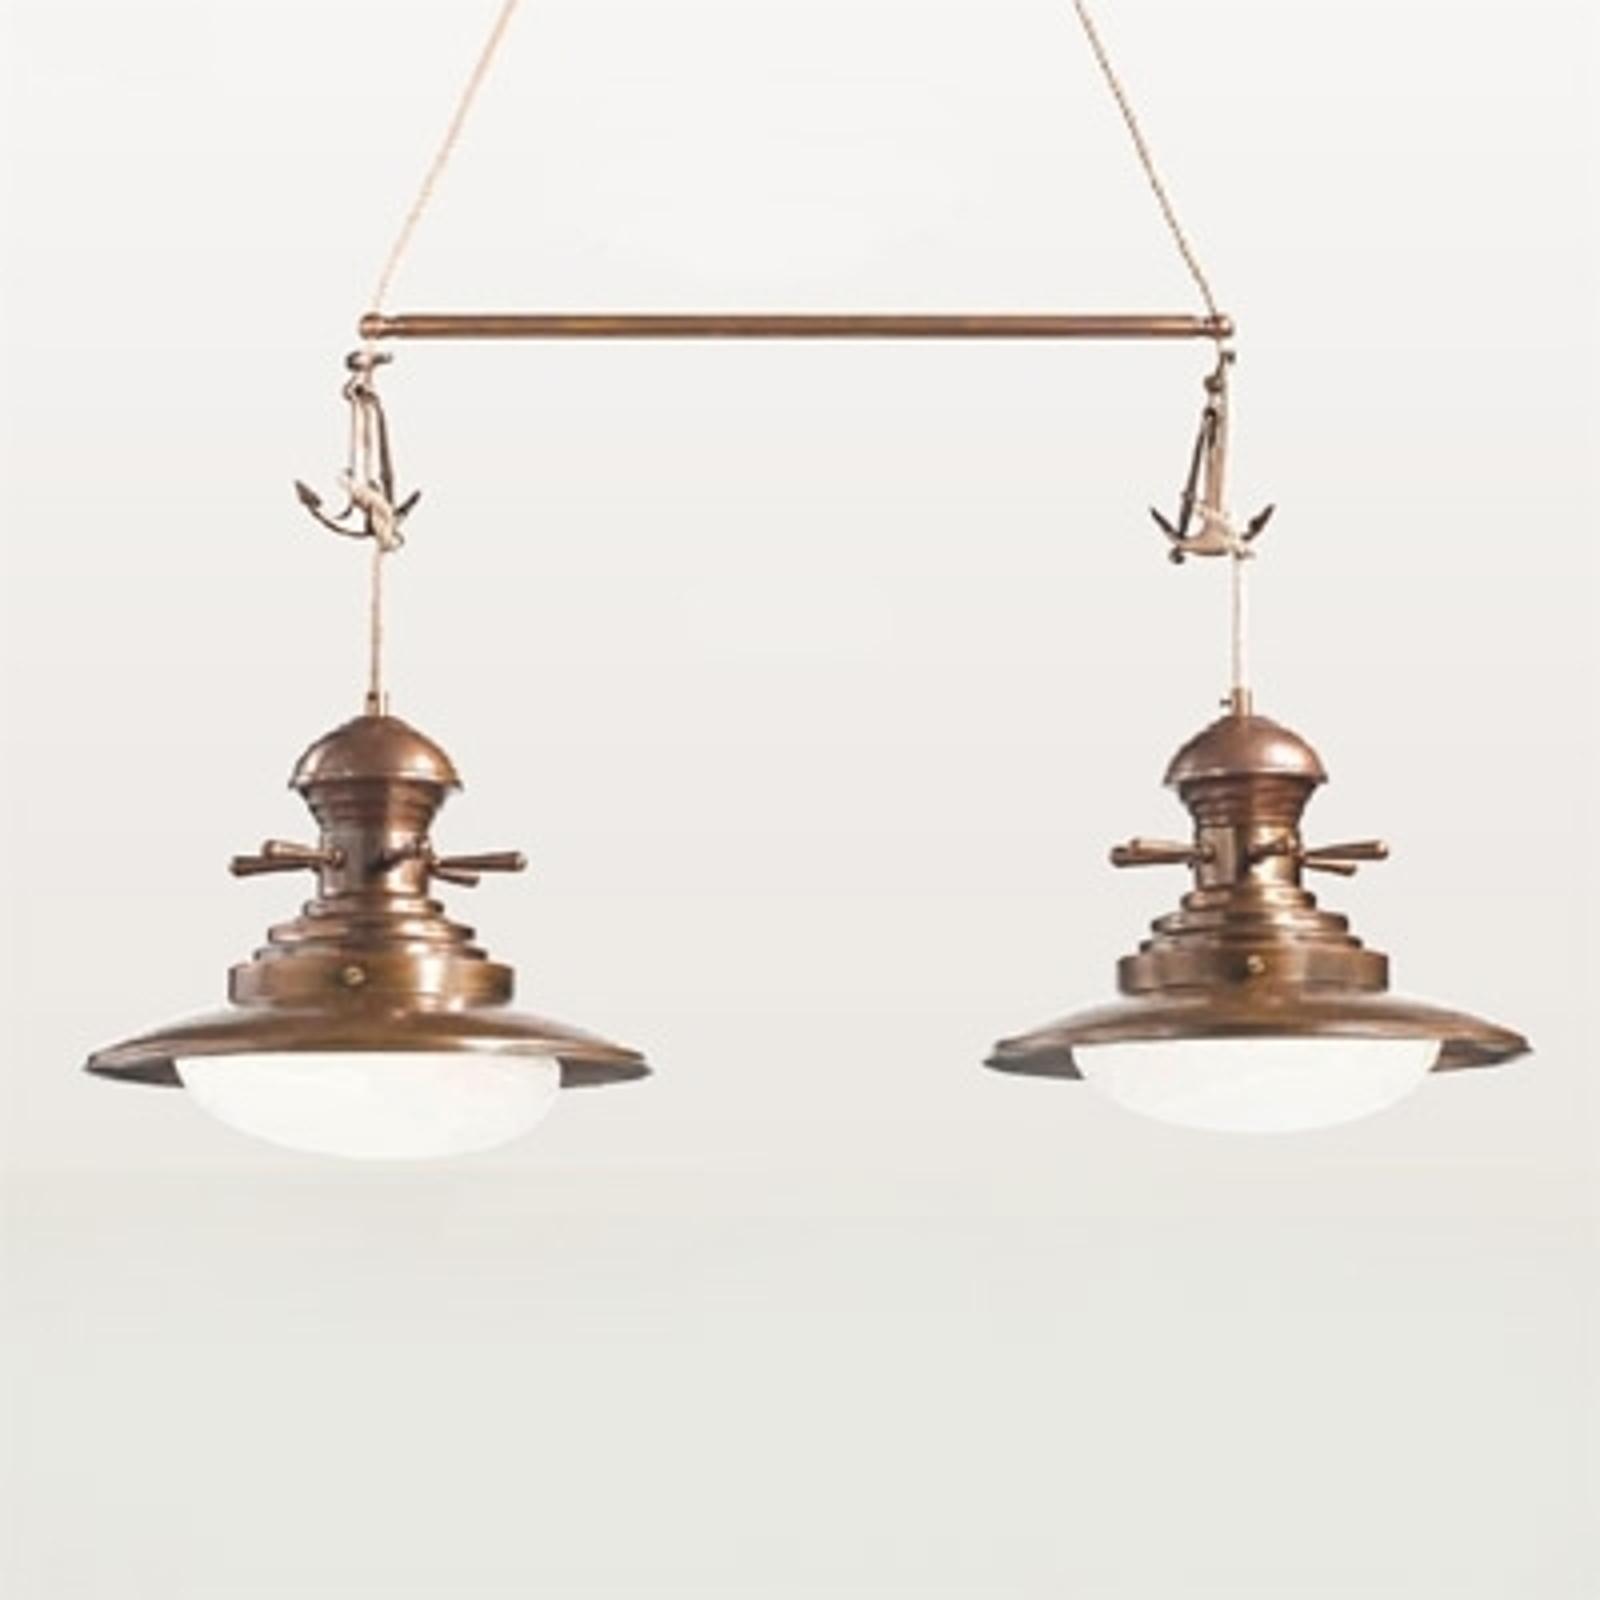 Pendellampa Baia, tvådelad, bronserad